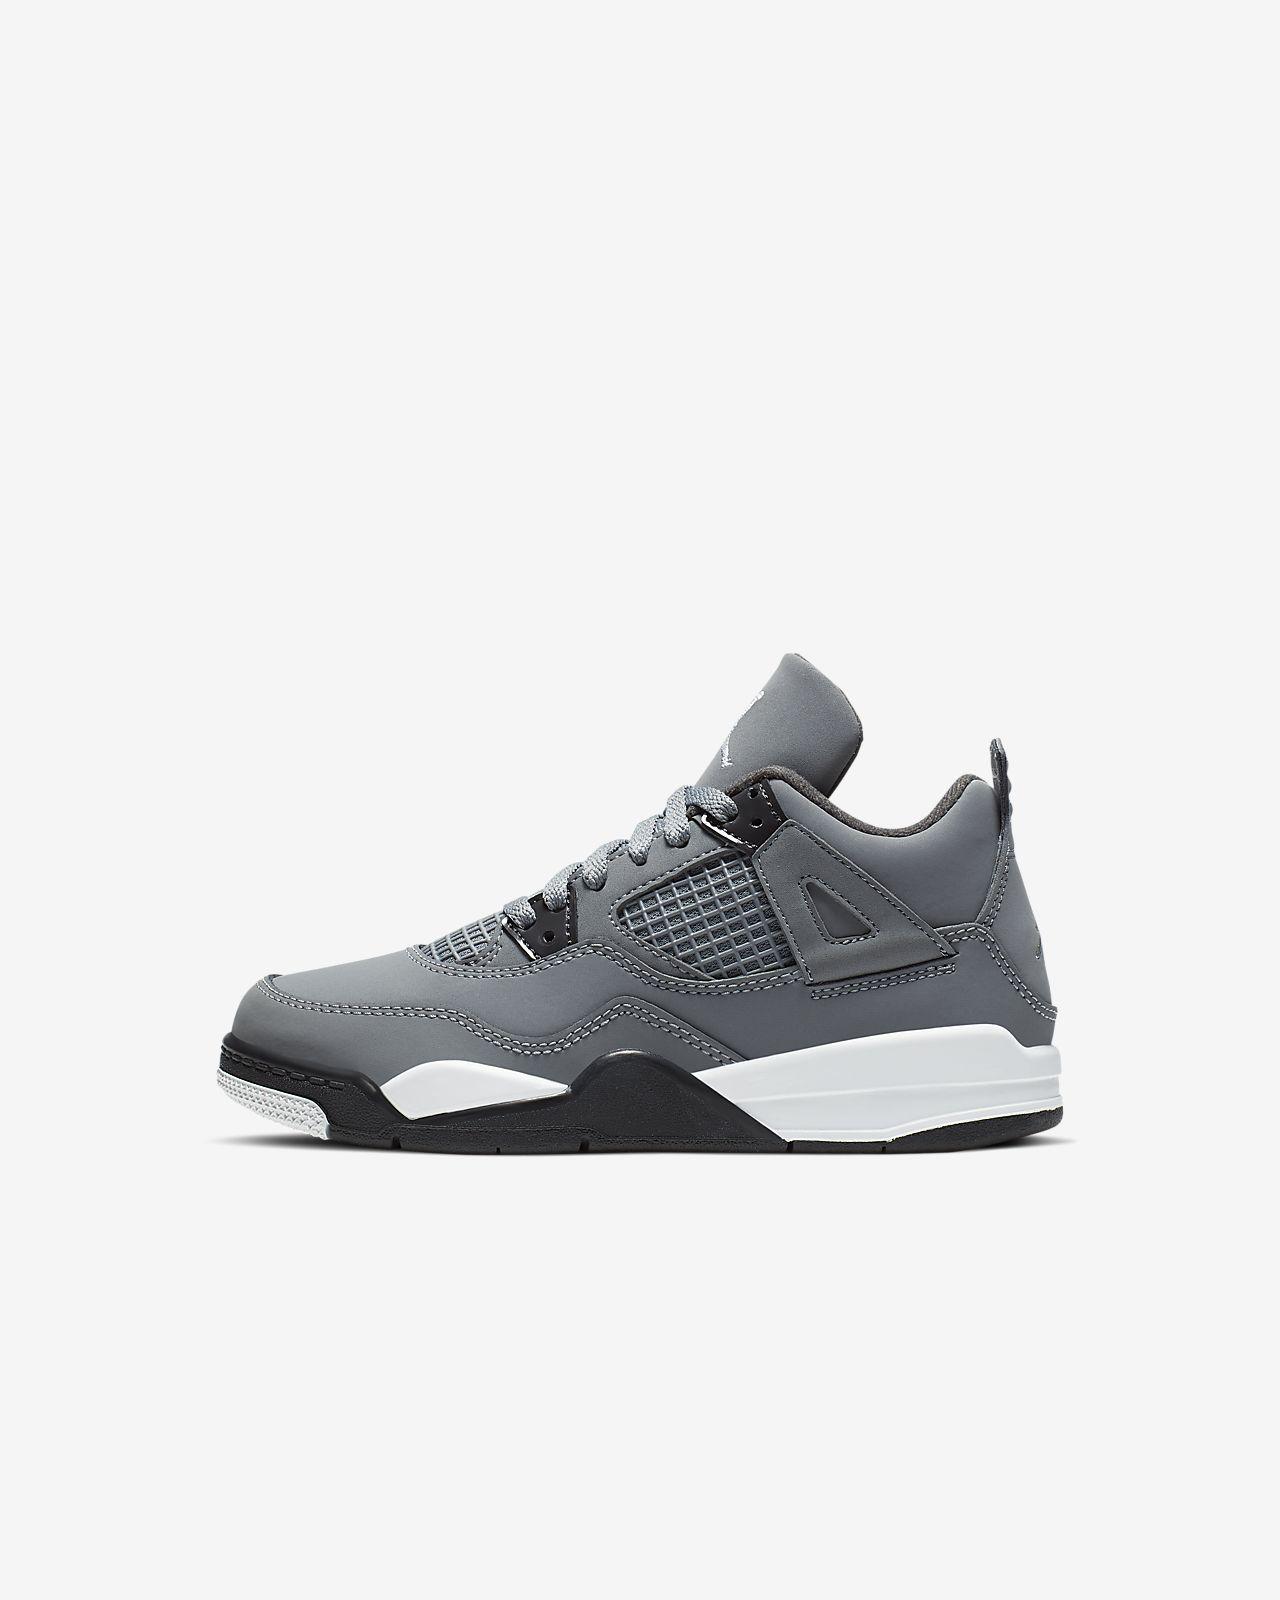 Jordan 4 Retro 小童鞋款